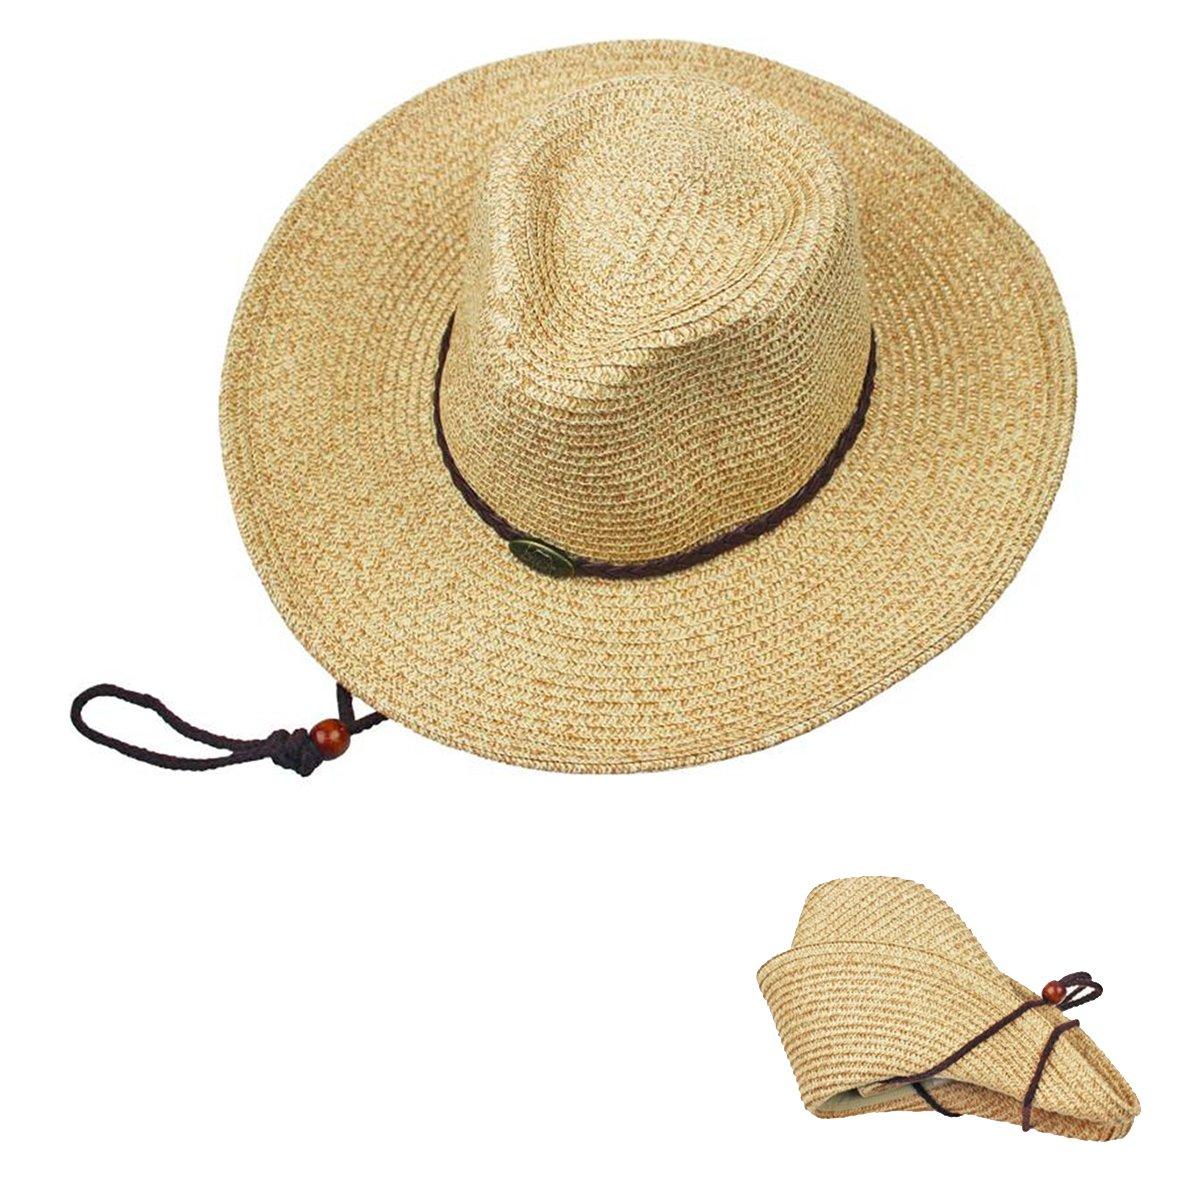 ARHSSZY Western Cowboy Folding Wide Brim Straw Hat Sun Hat Beach Cap Panama Hats ZDstraw-begie